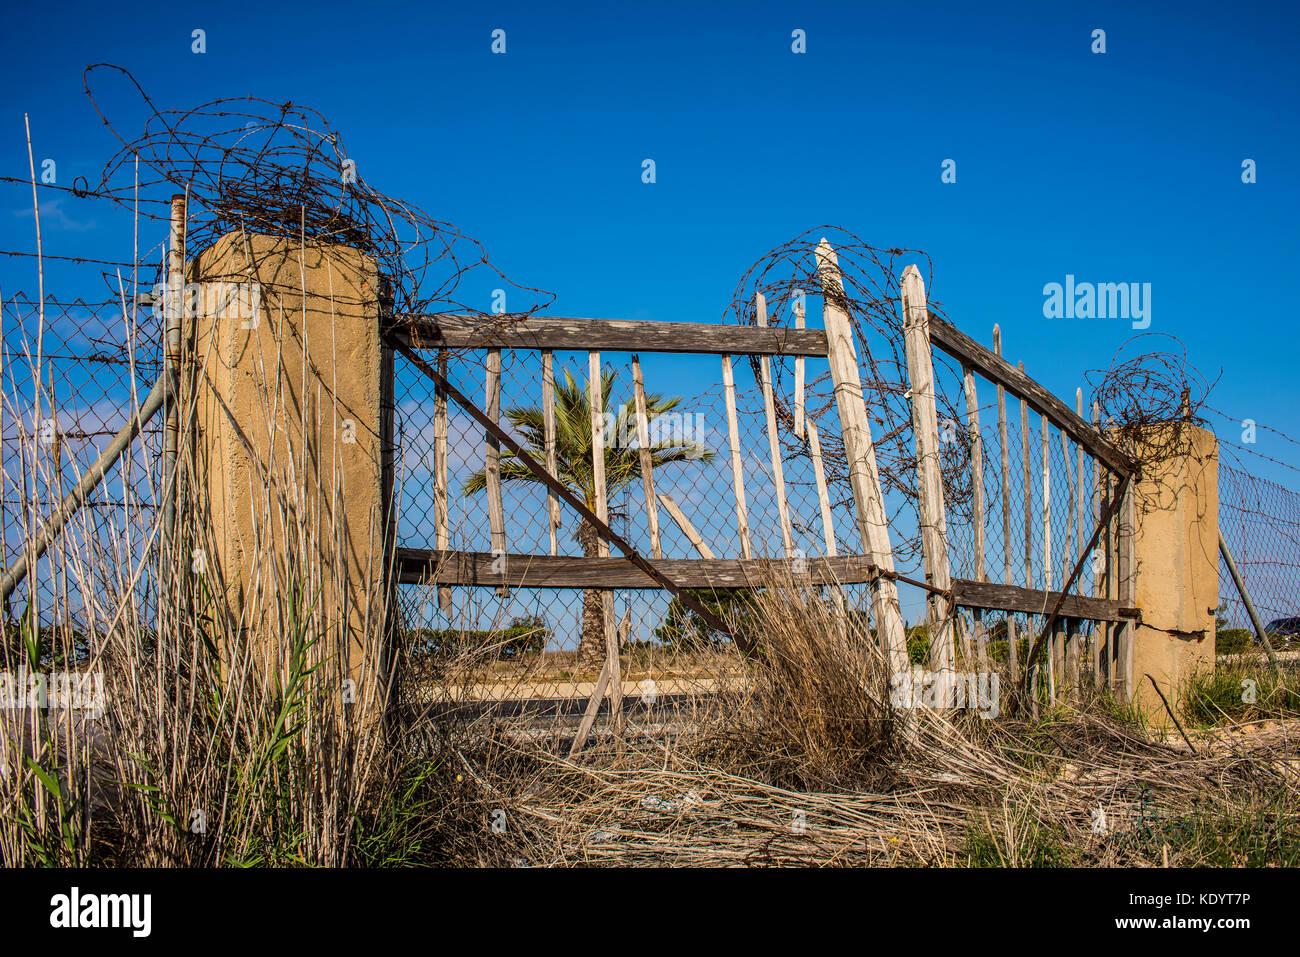 Wooden Gates Stock Photos Amp Wooden Gates Stock Images Alamy